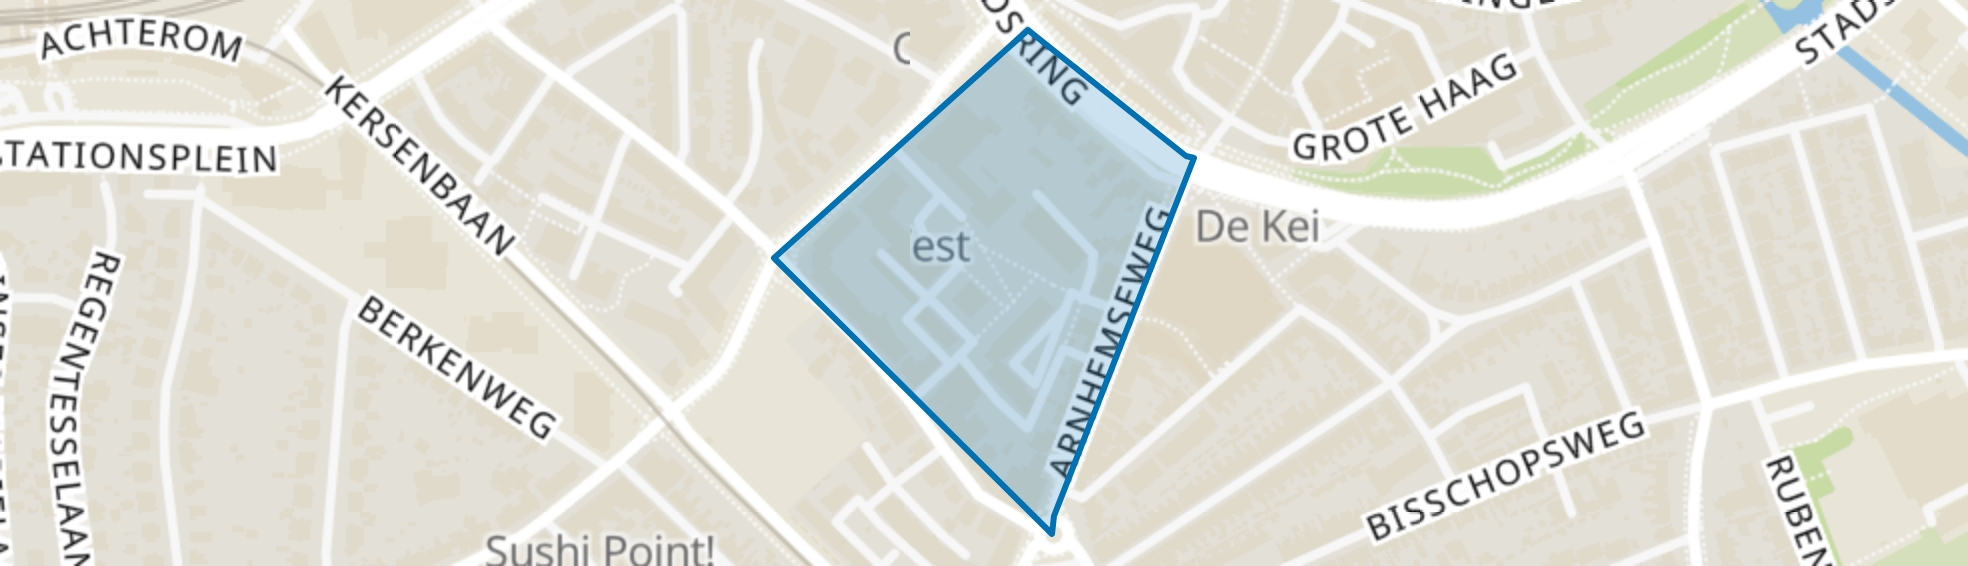 Zonnehof, Amersfoort map